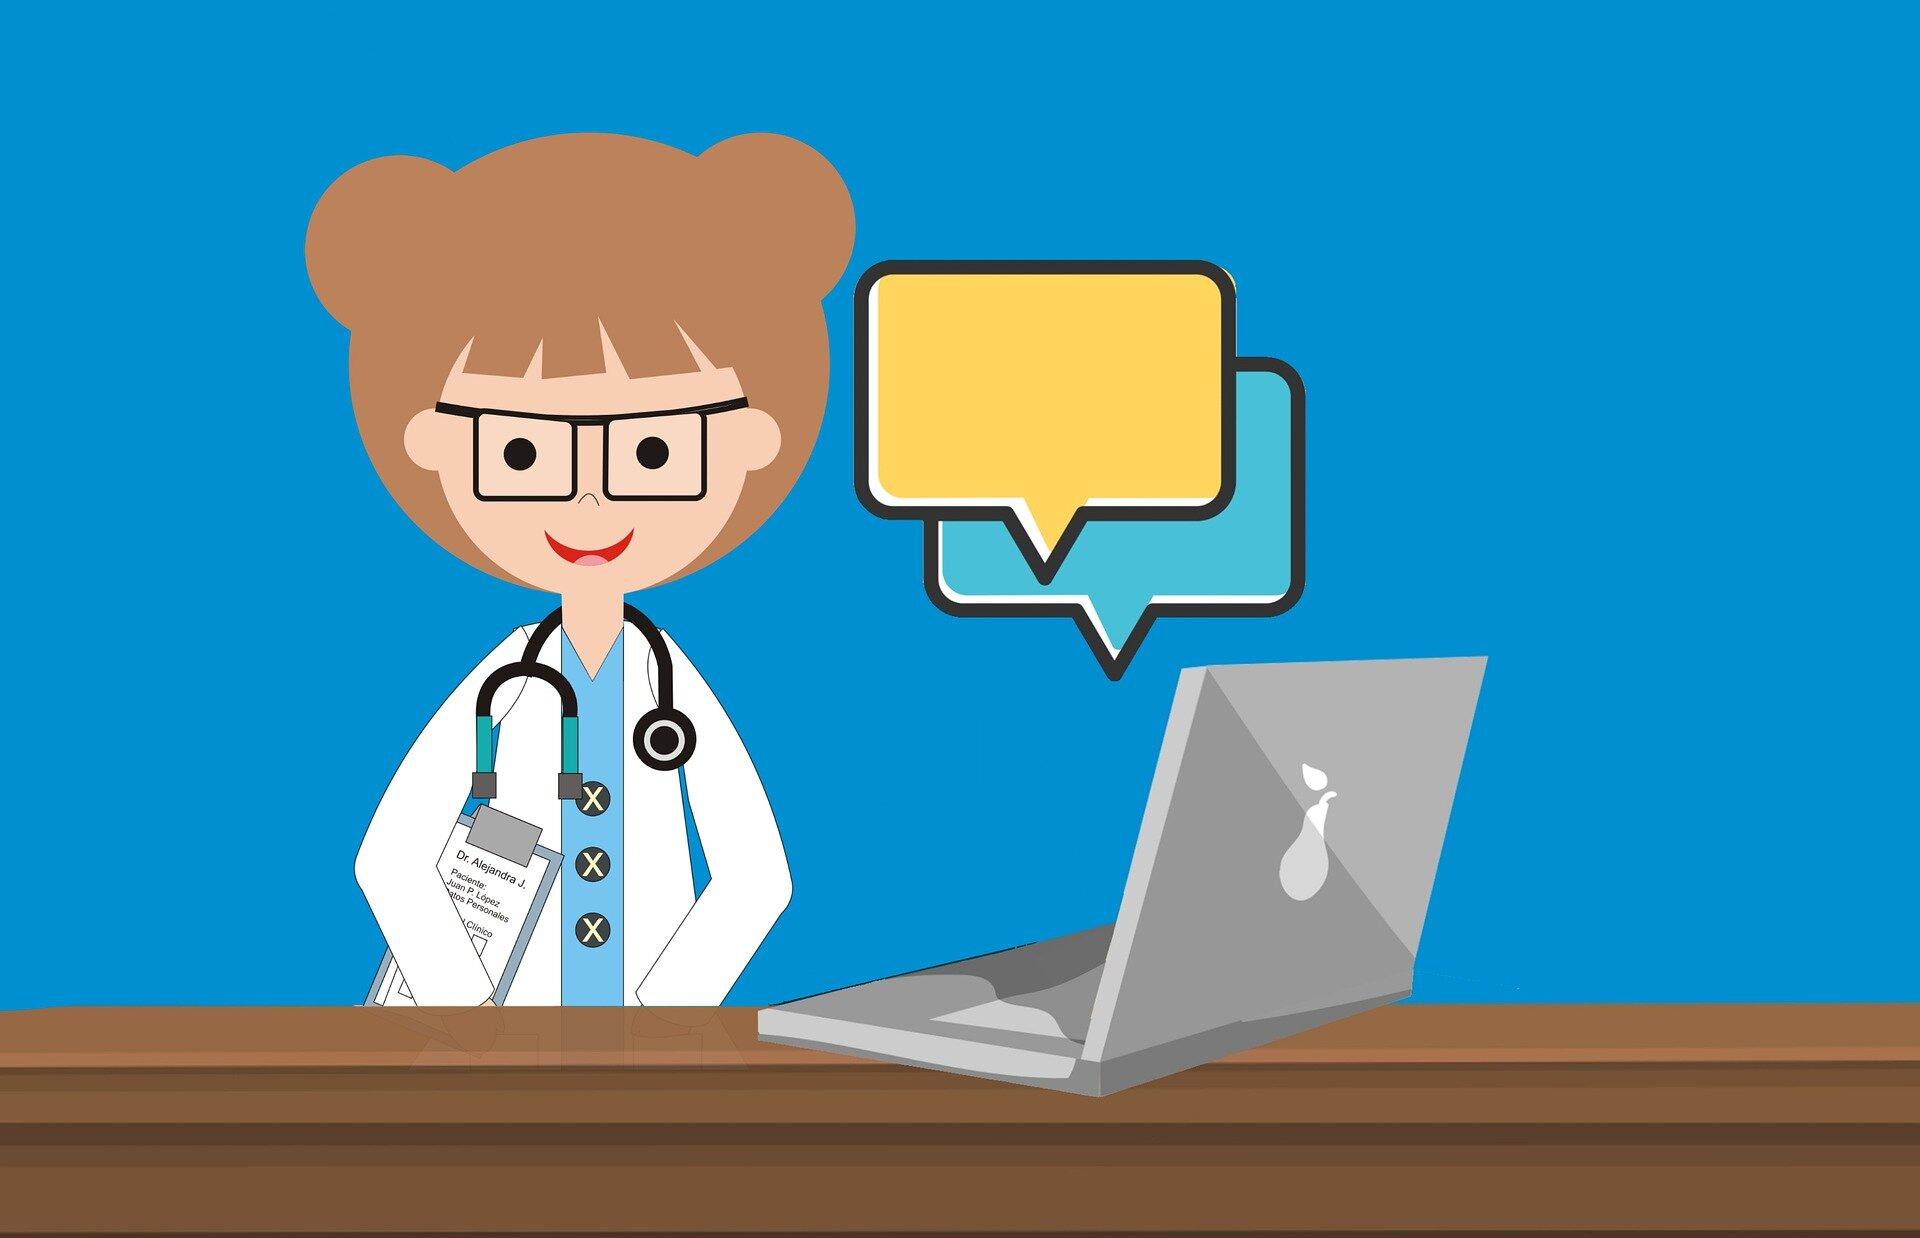 Coronavirus has forced doctors, insurers to embrace telemedicine like never before